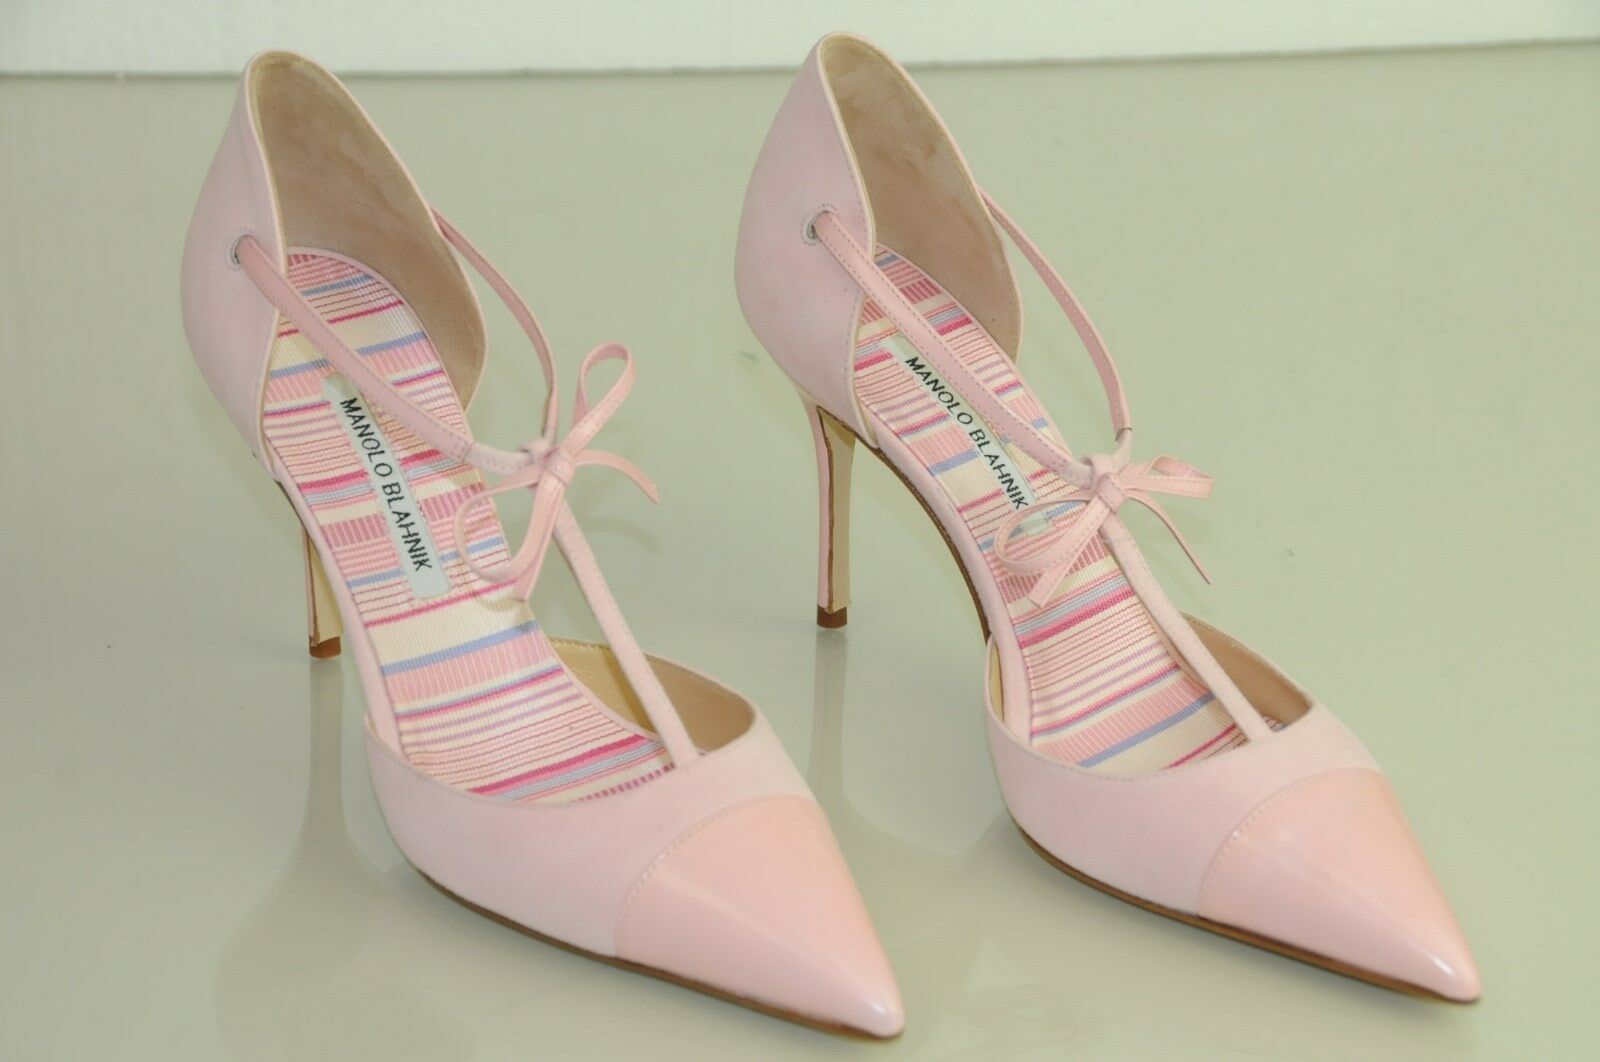 Neuf Femmeolo Blahnik Parigatama Rose Cuir Daim Chaussures Cheville Bride Cheville Chaussures 41 41.5 8cdee8